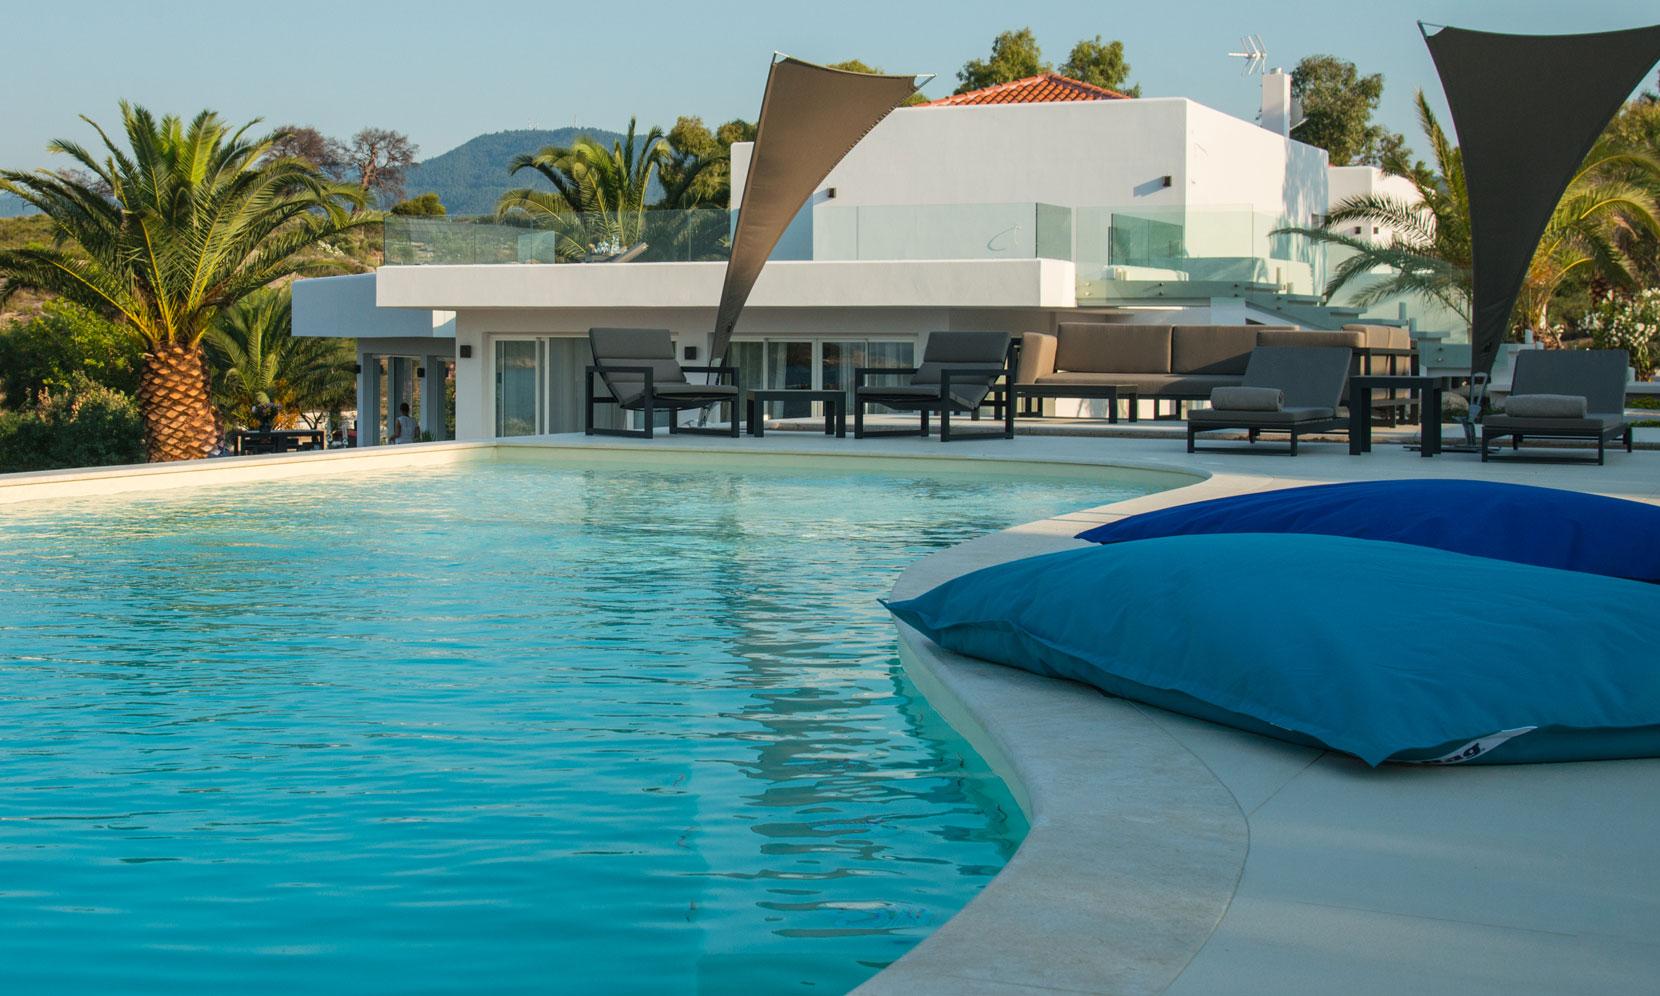 Halkidiki Villa Corali jumbotron image